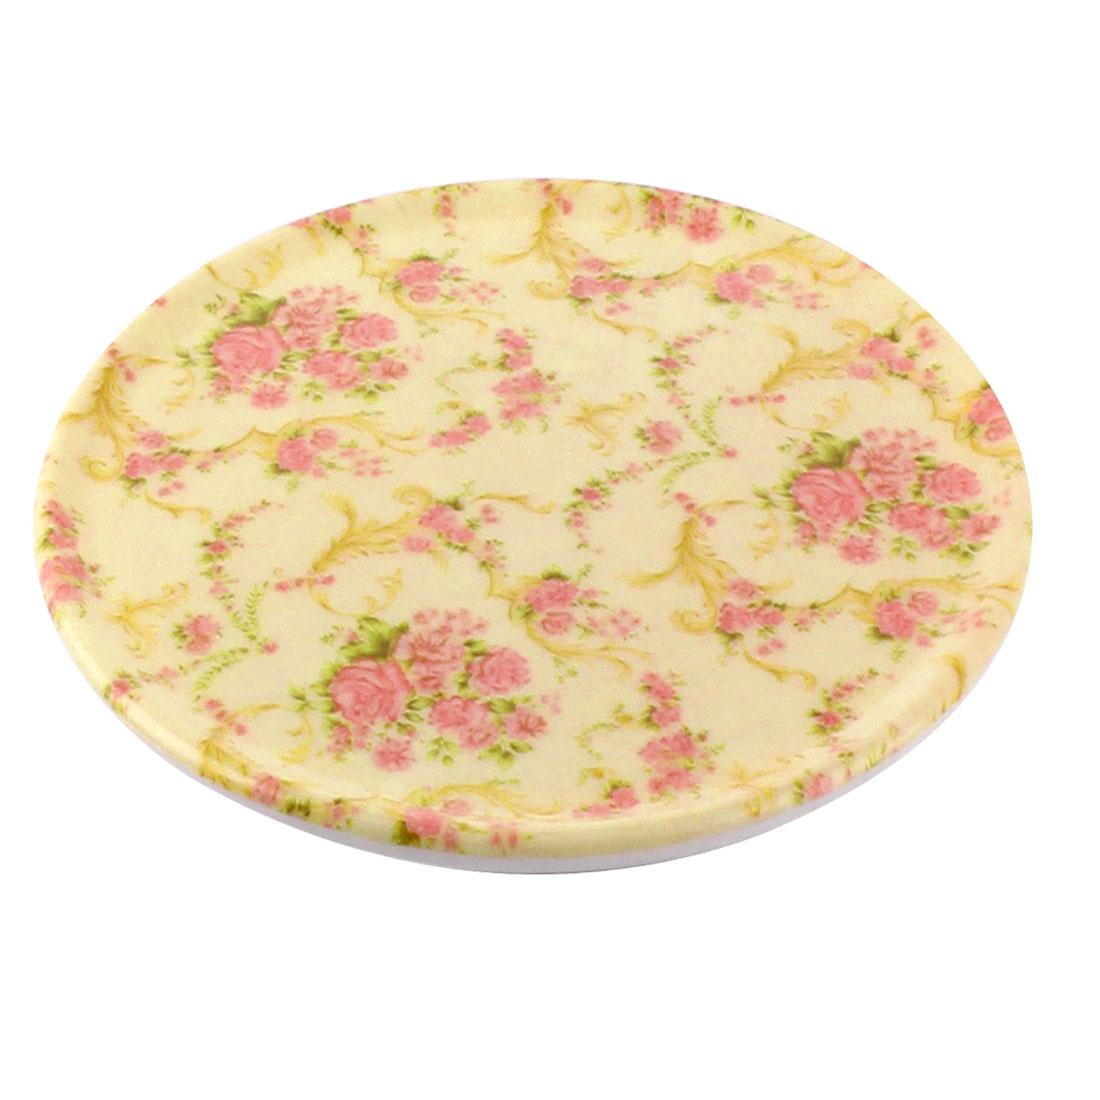 Tableware Melamine Chinese Rose Pattern Heat Insulation Placemat Dish Plate Mat 16.5 Dia